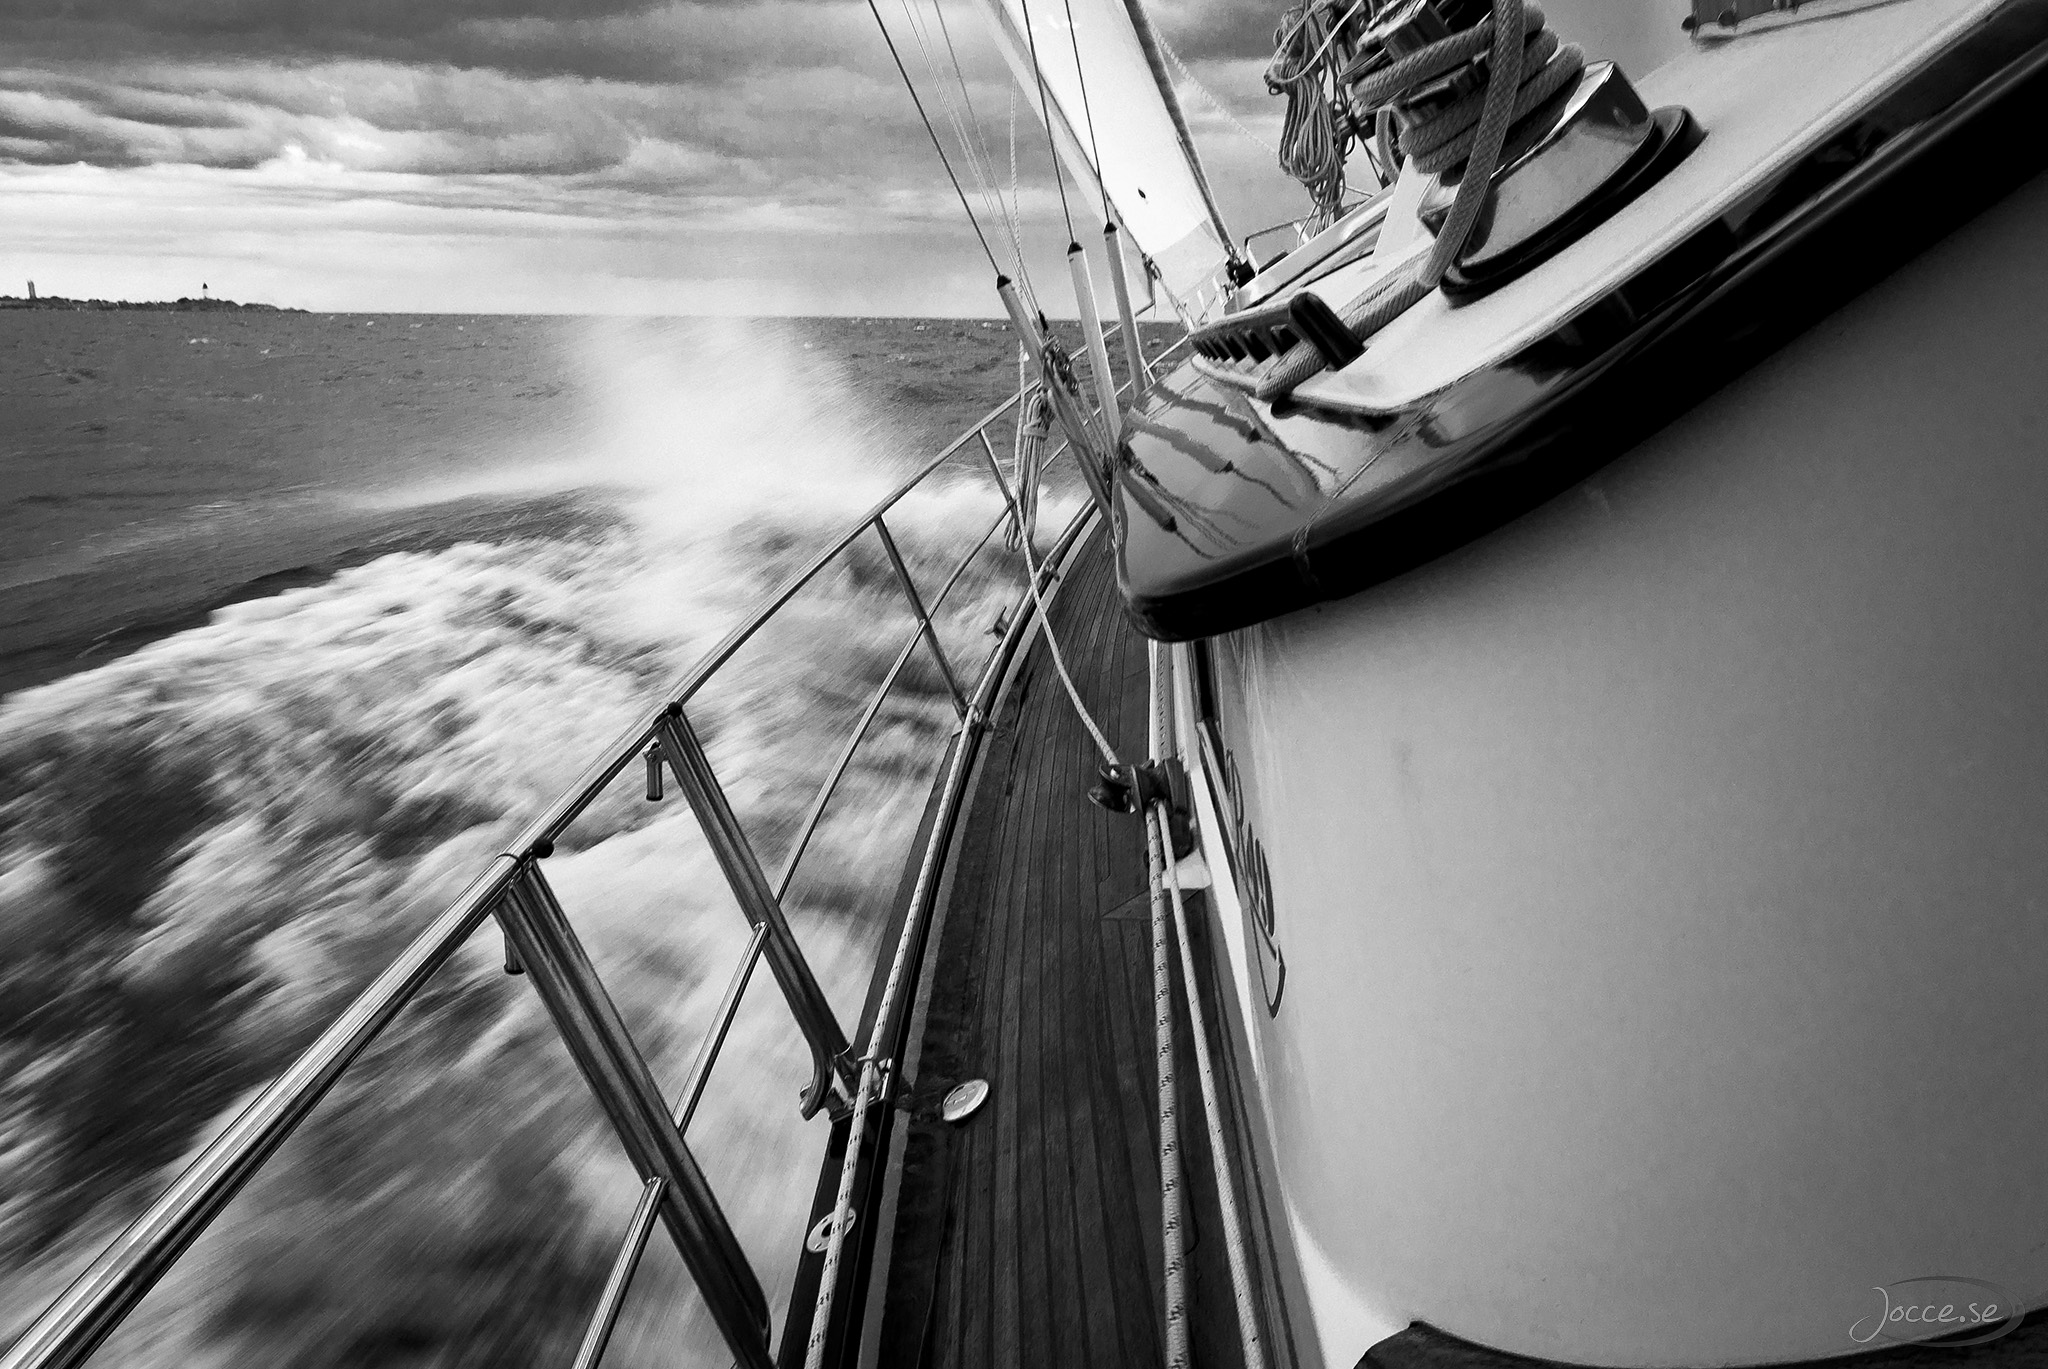 Hård segling